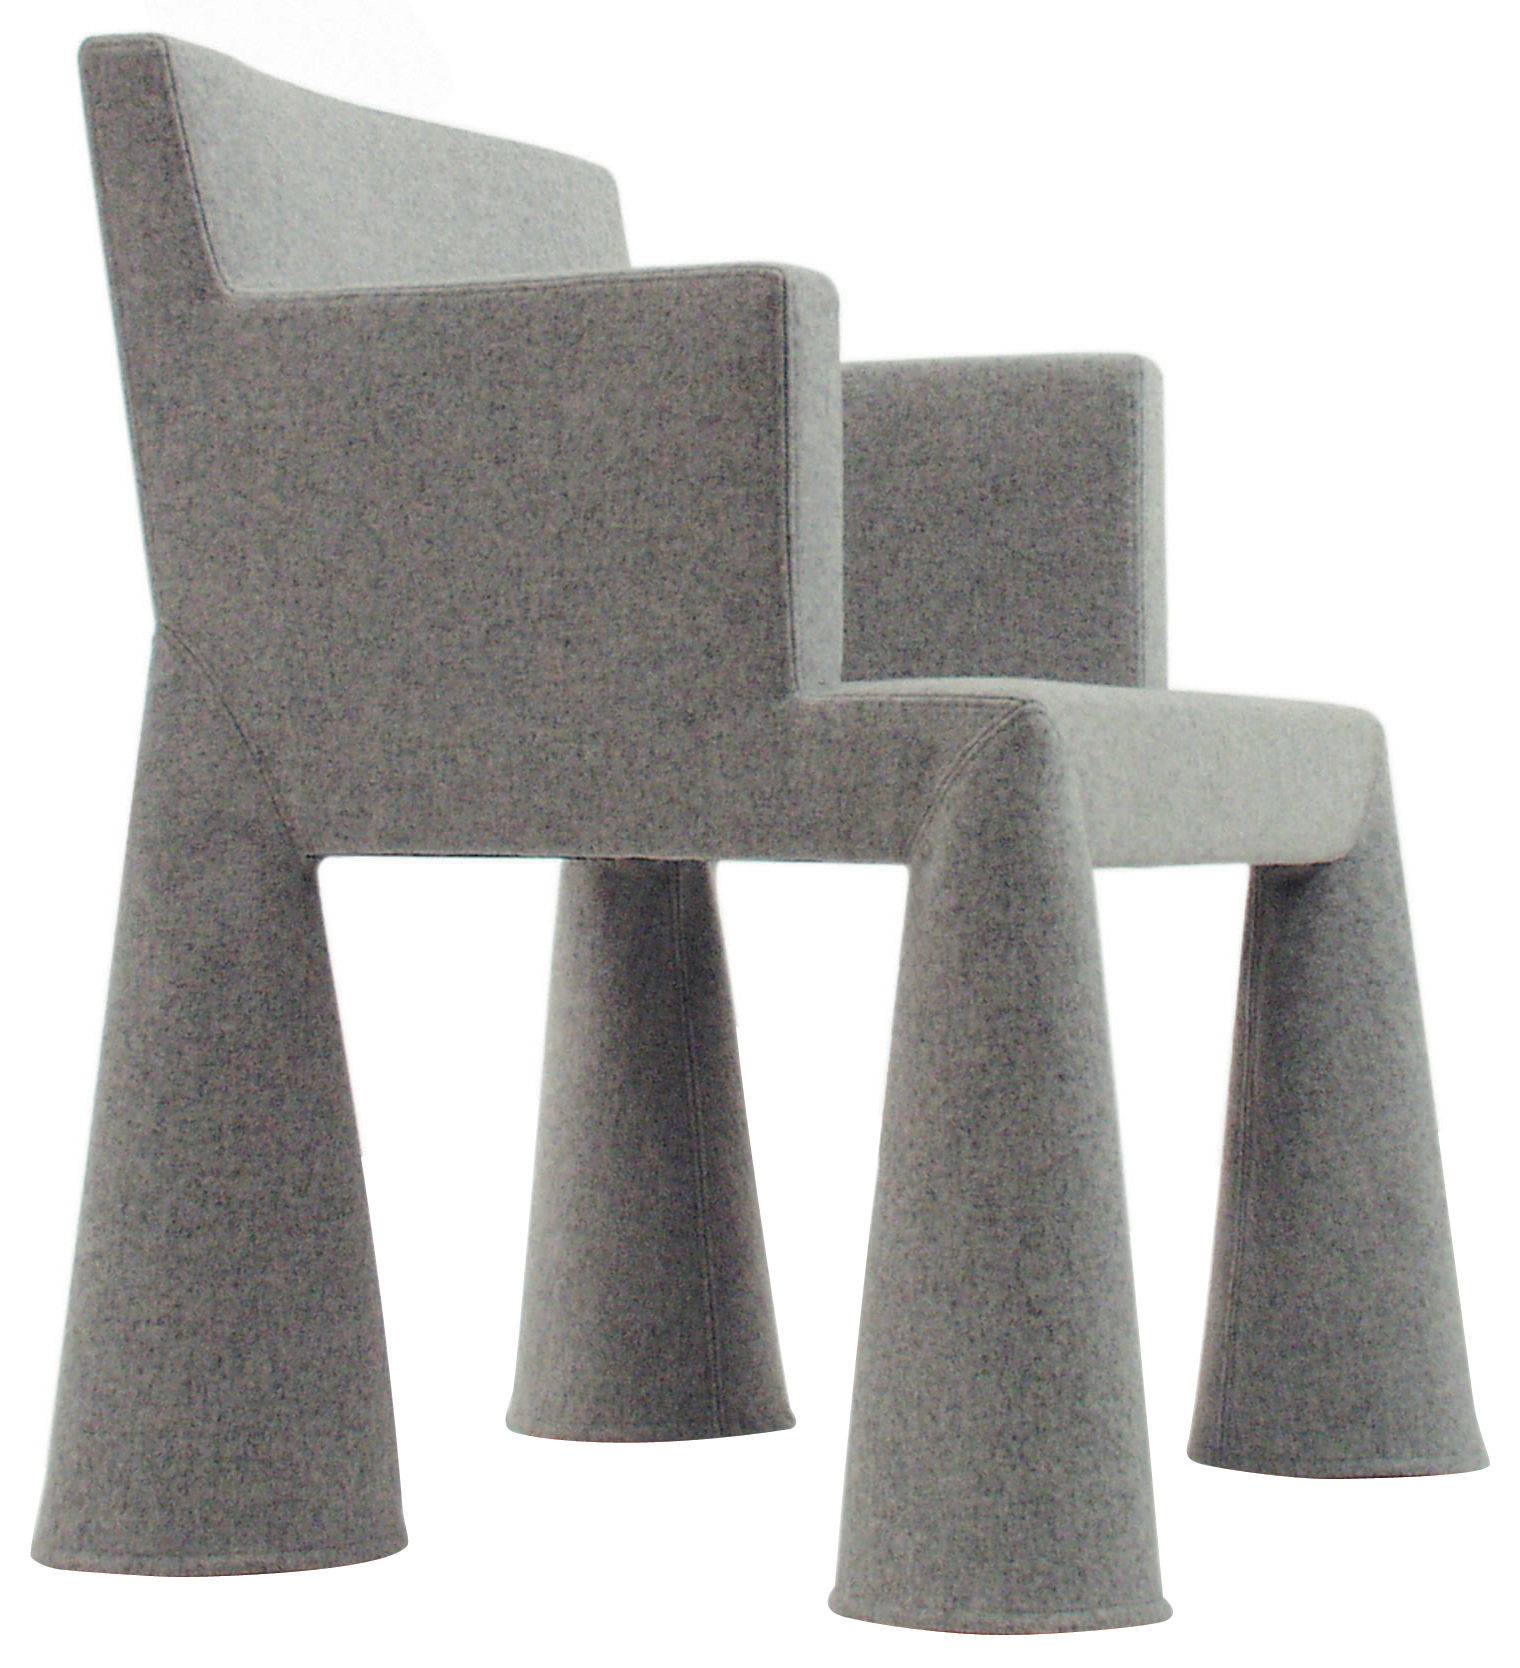 Arredamento - Mobili Ados  - Poltrona a rotelle V.I.P. Chair di Moooi - Grigio chiaro - Acciaio, Espanso, Lana